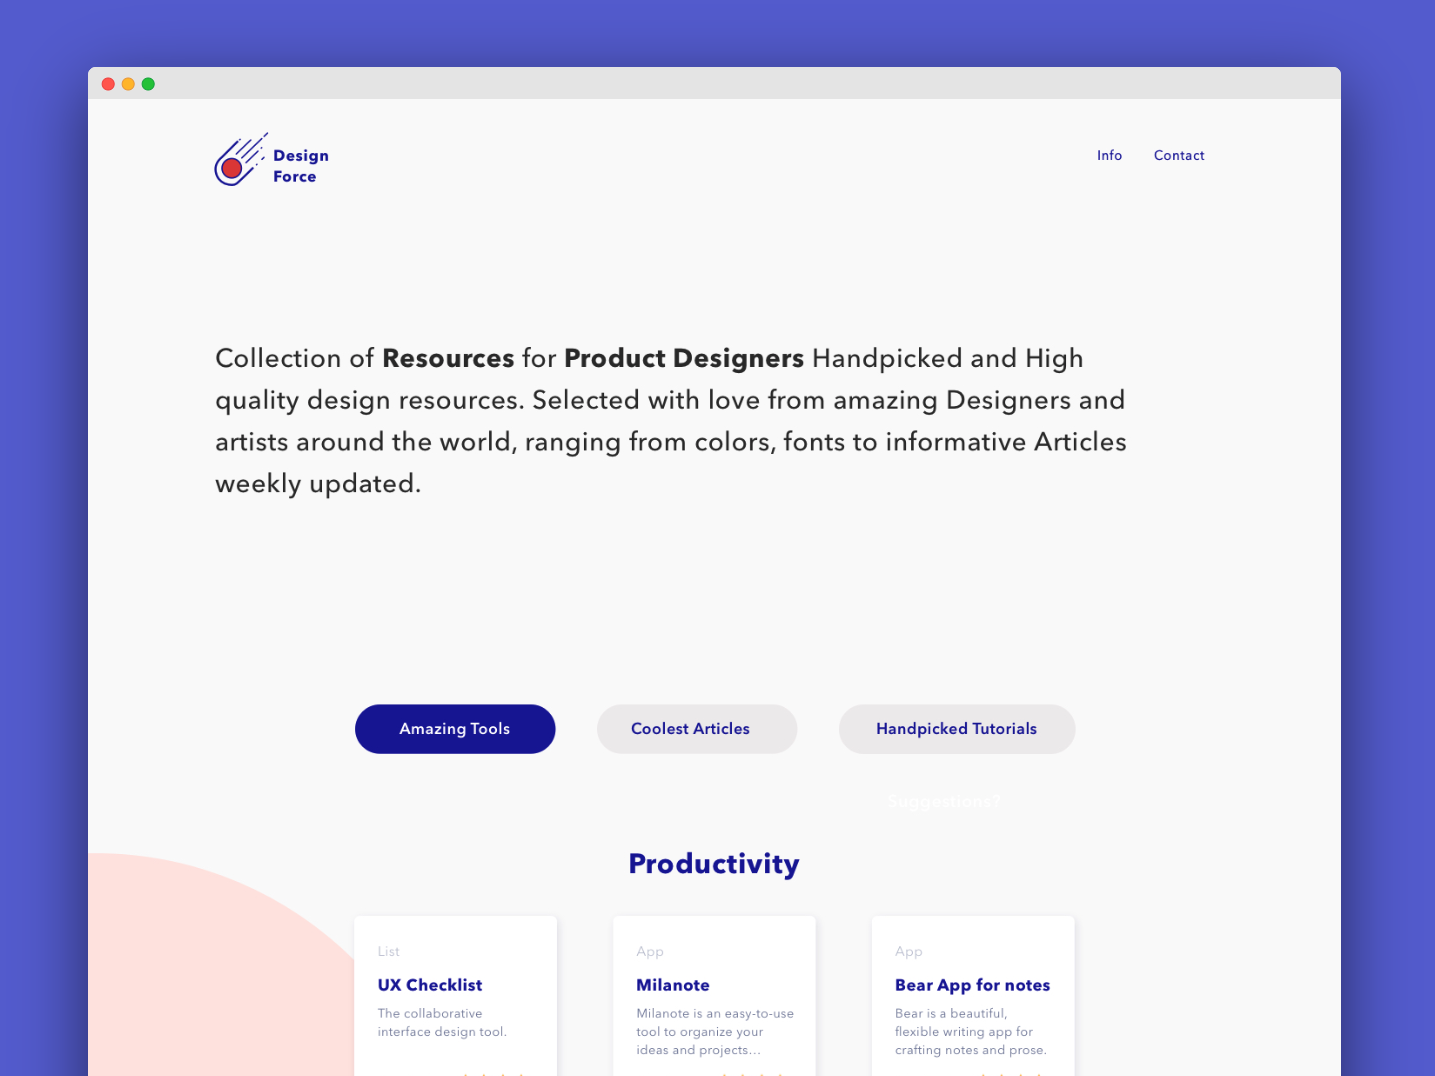 Landingpage Design Force in Progress design pracitice typography illustration minimal flat clean design ui web ux product design logo sketch app design productdesign uxui